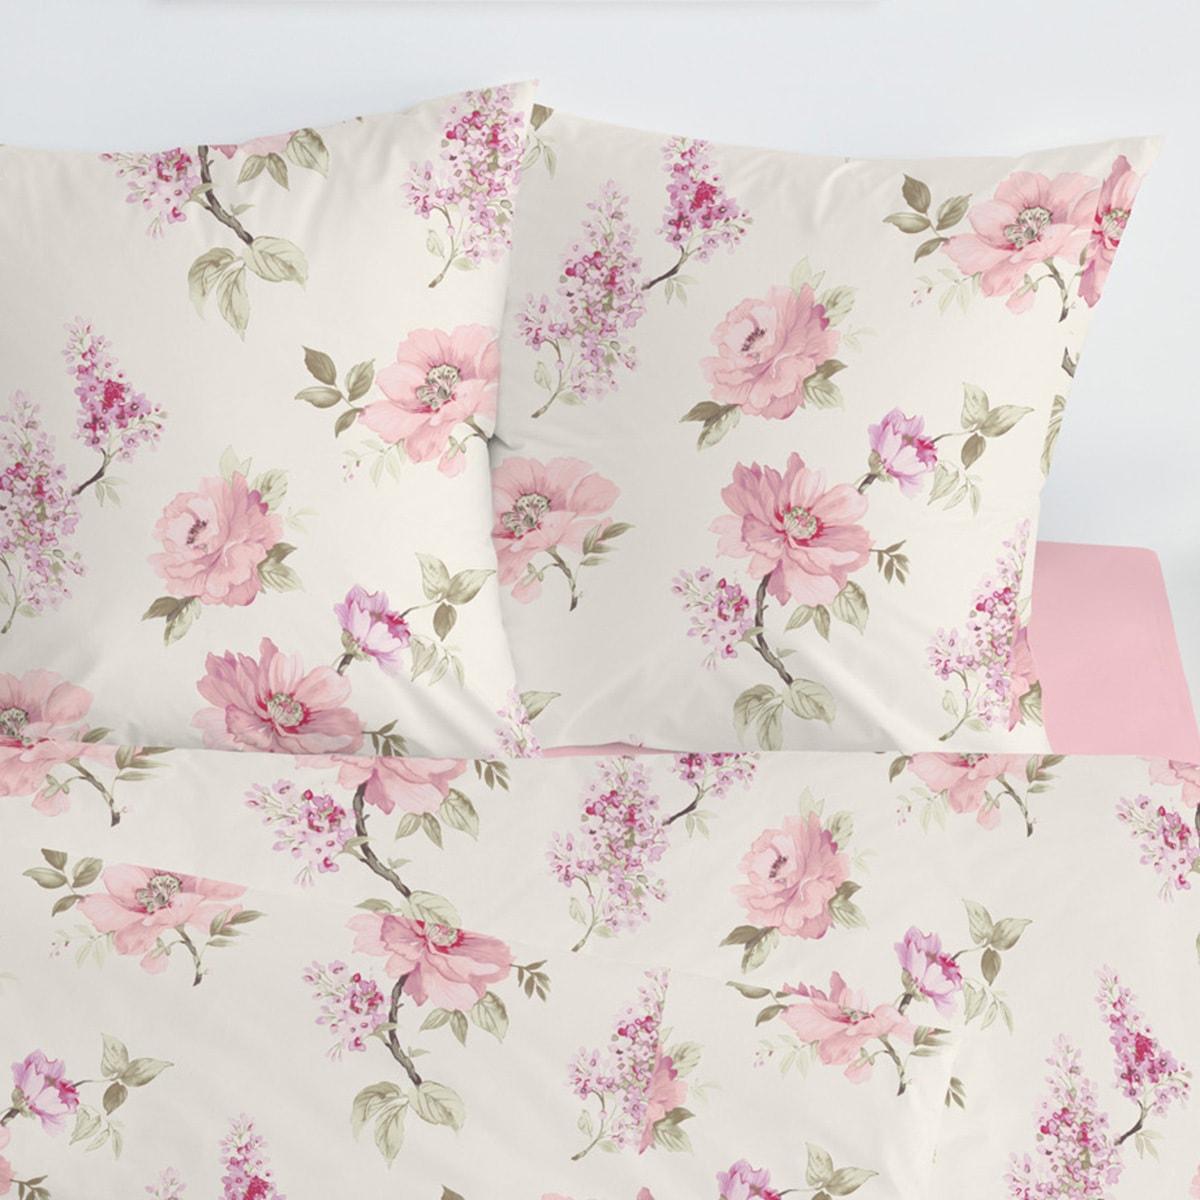 estella mako satin bettw sche 7028 400 rosa g nstig online. Black Bedroom Furniture Sets. Home Design Ideas